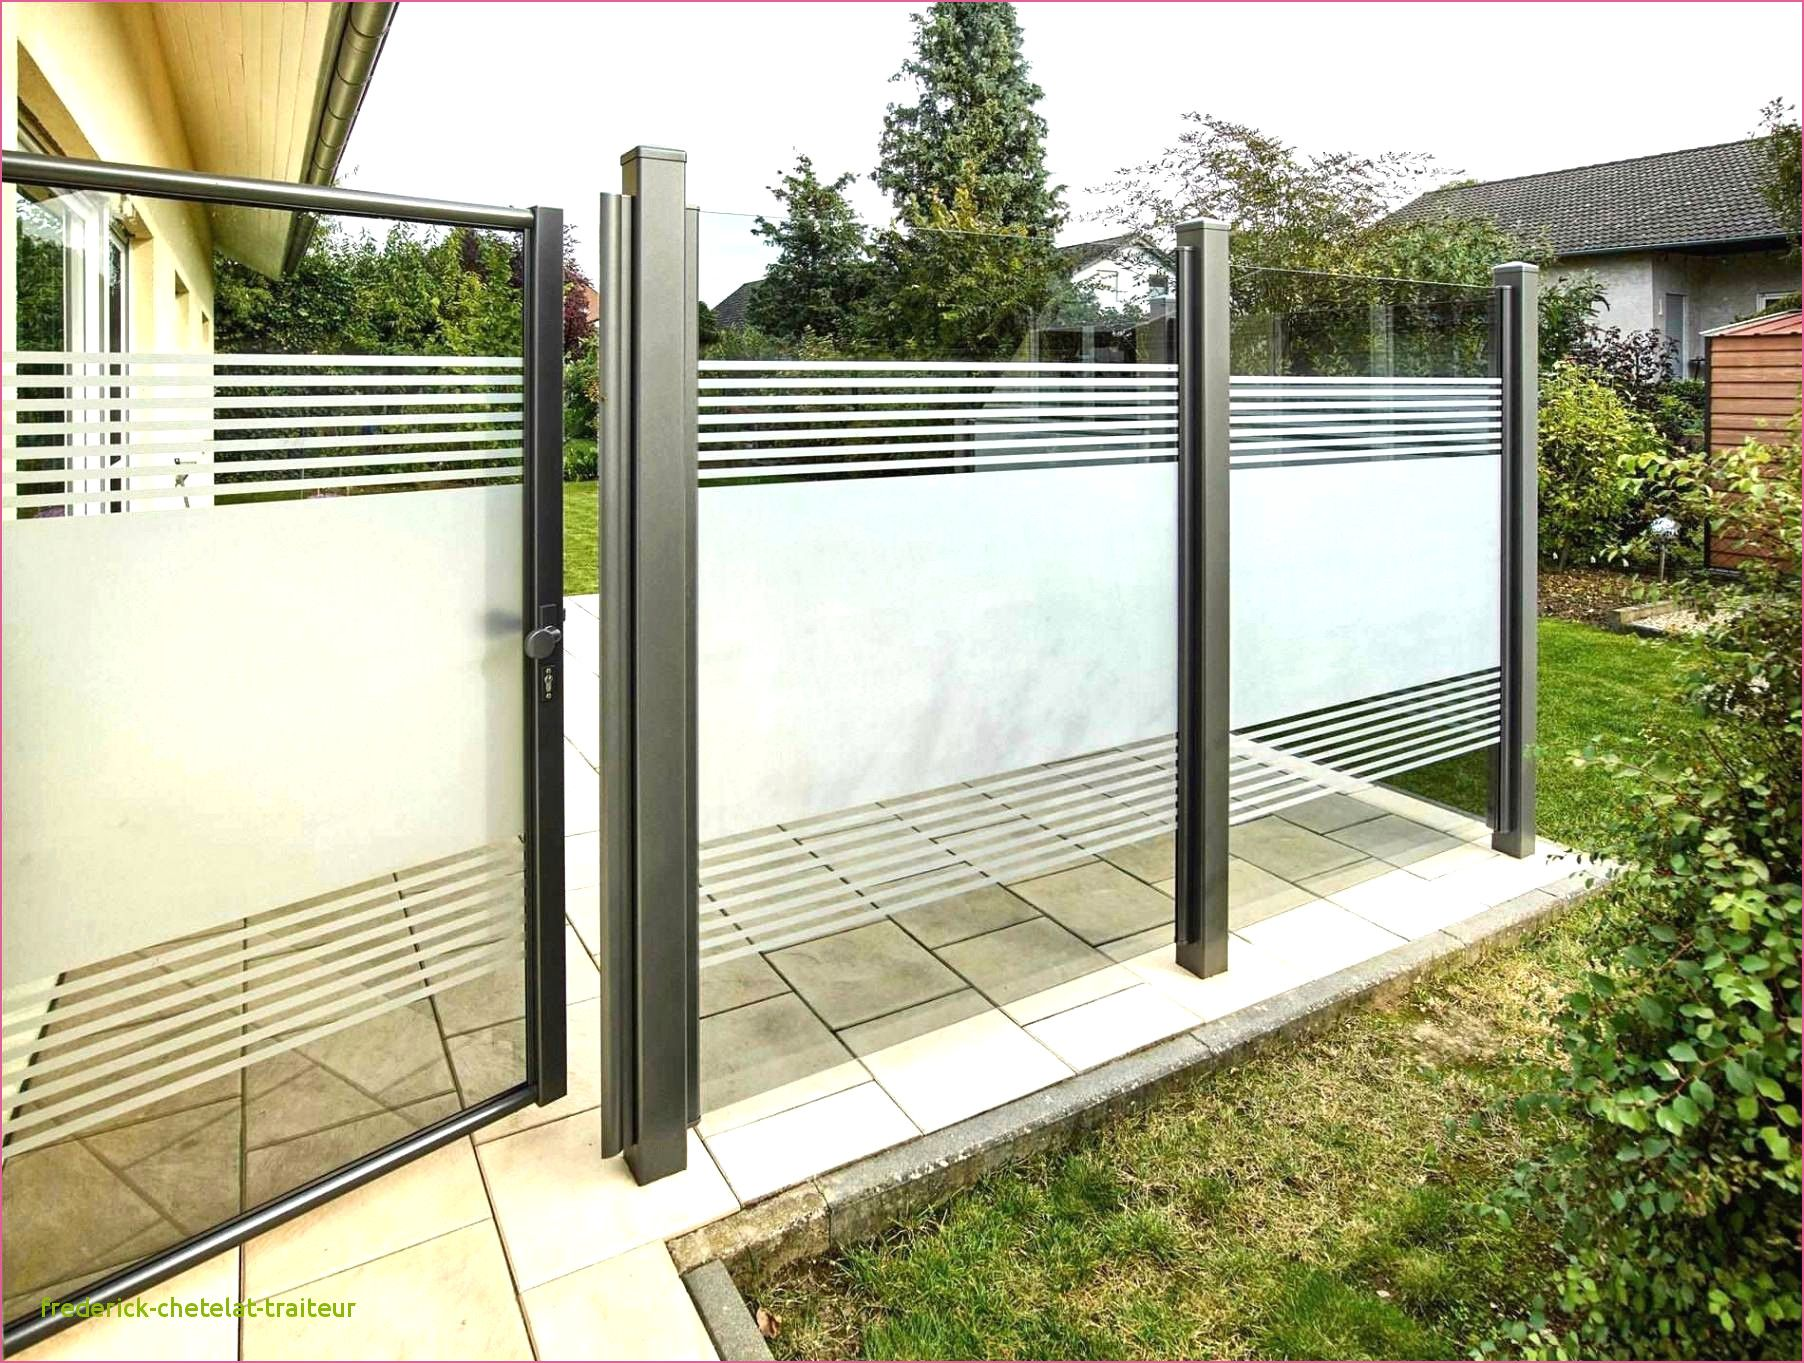 Hochbeet Abdeckung Plexiglas Ecrans Exterieurs Terrasse Toit